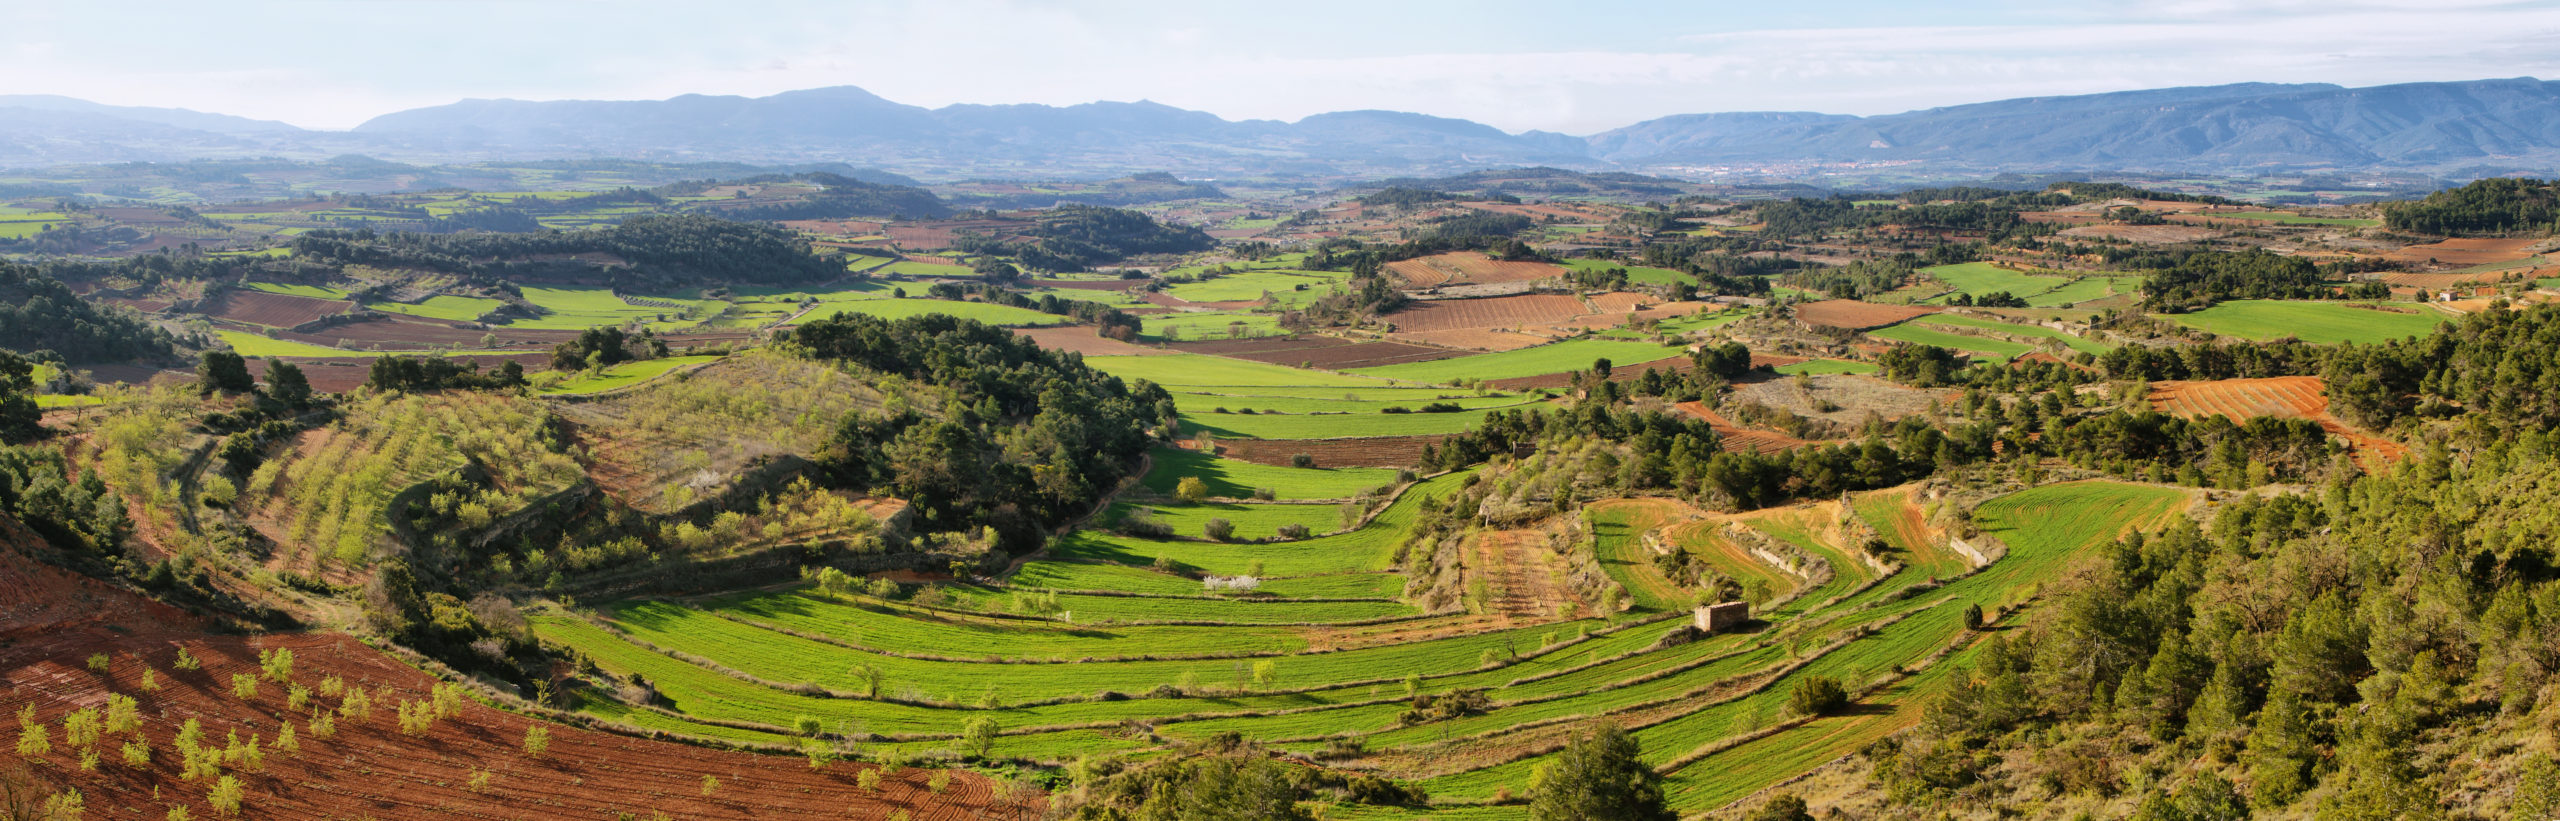 Agricultura abancalada